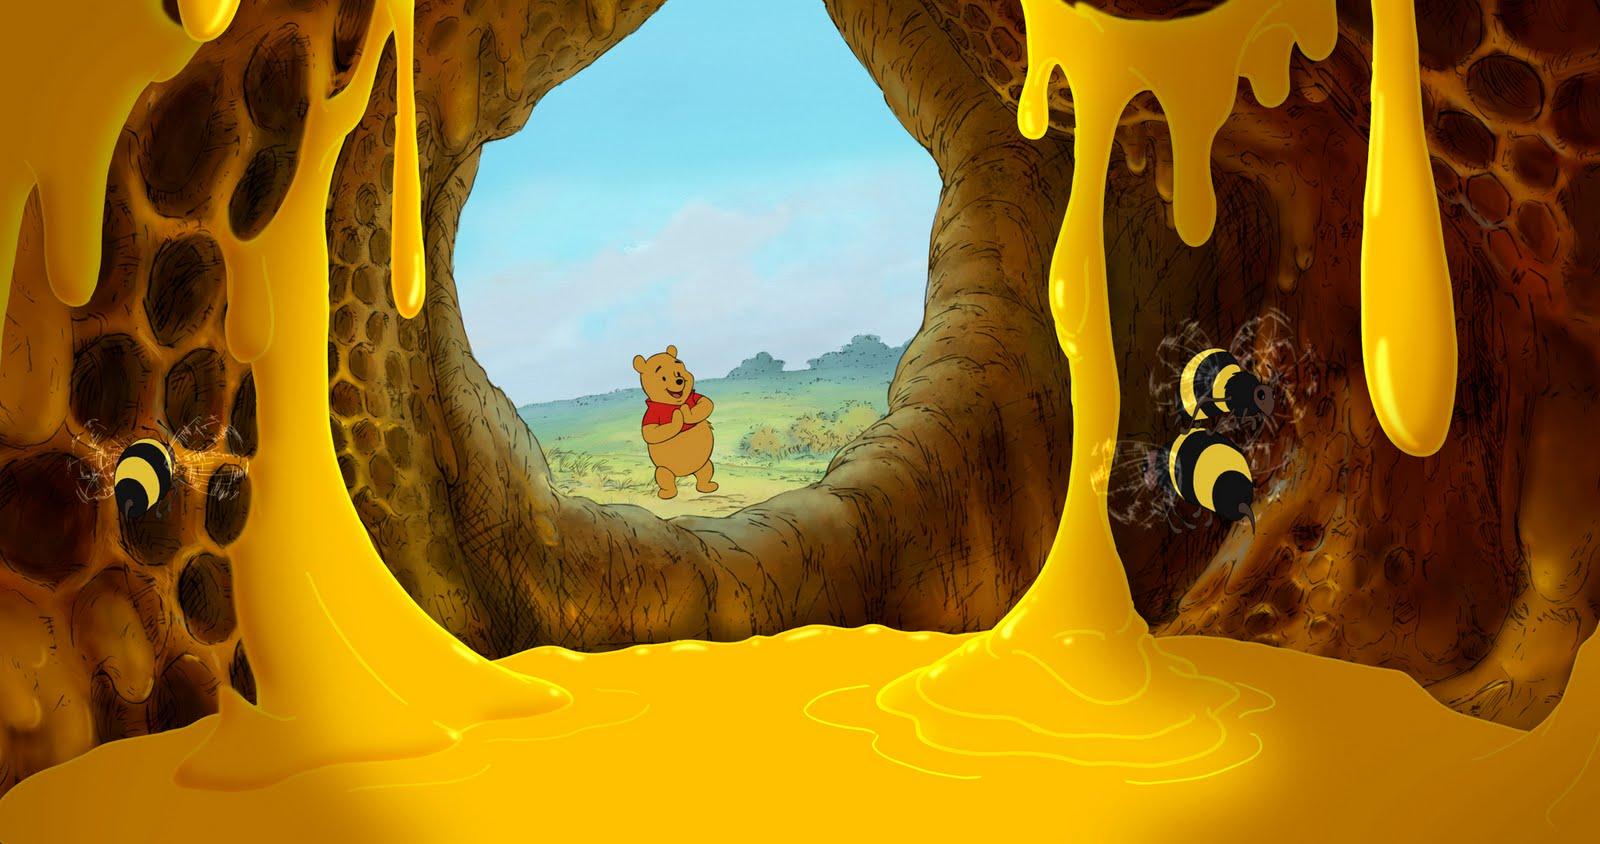 winnie-the-pooh-movie-3